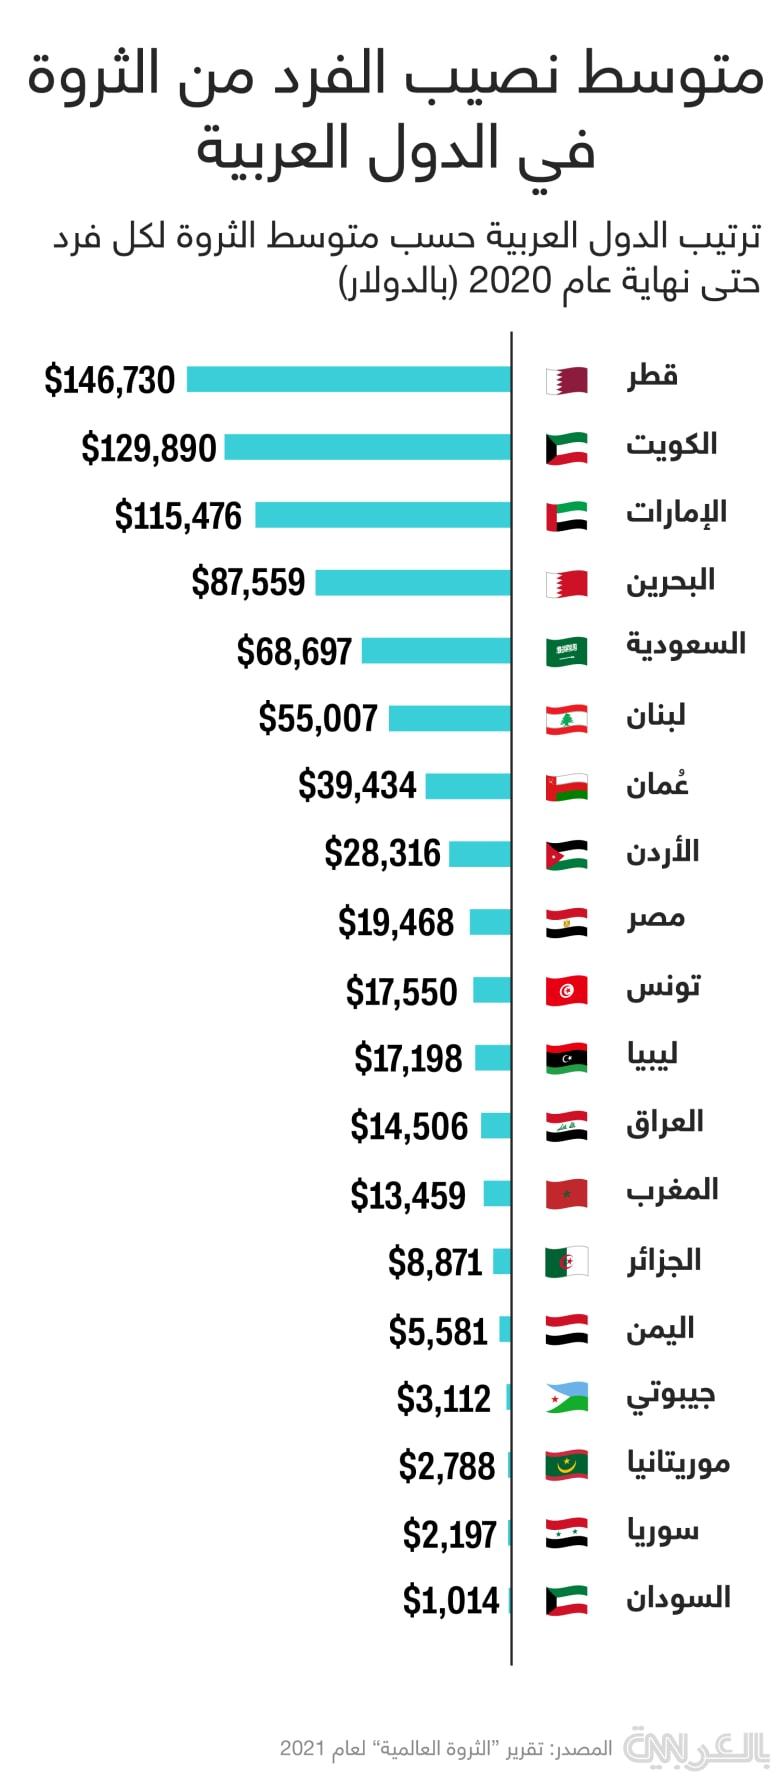 arab-countries-wealth-2021